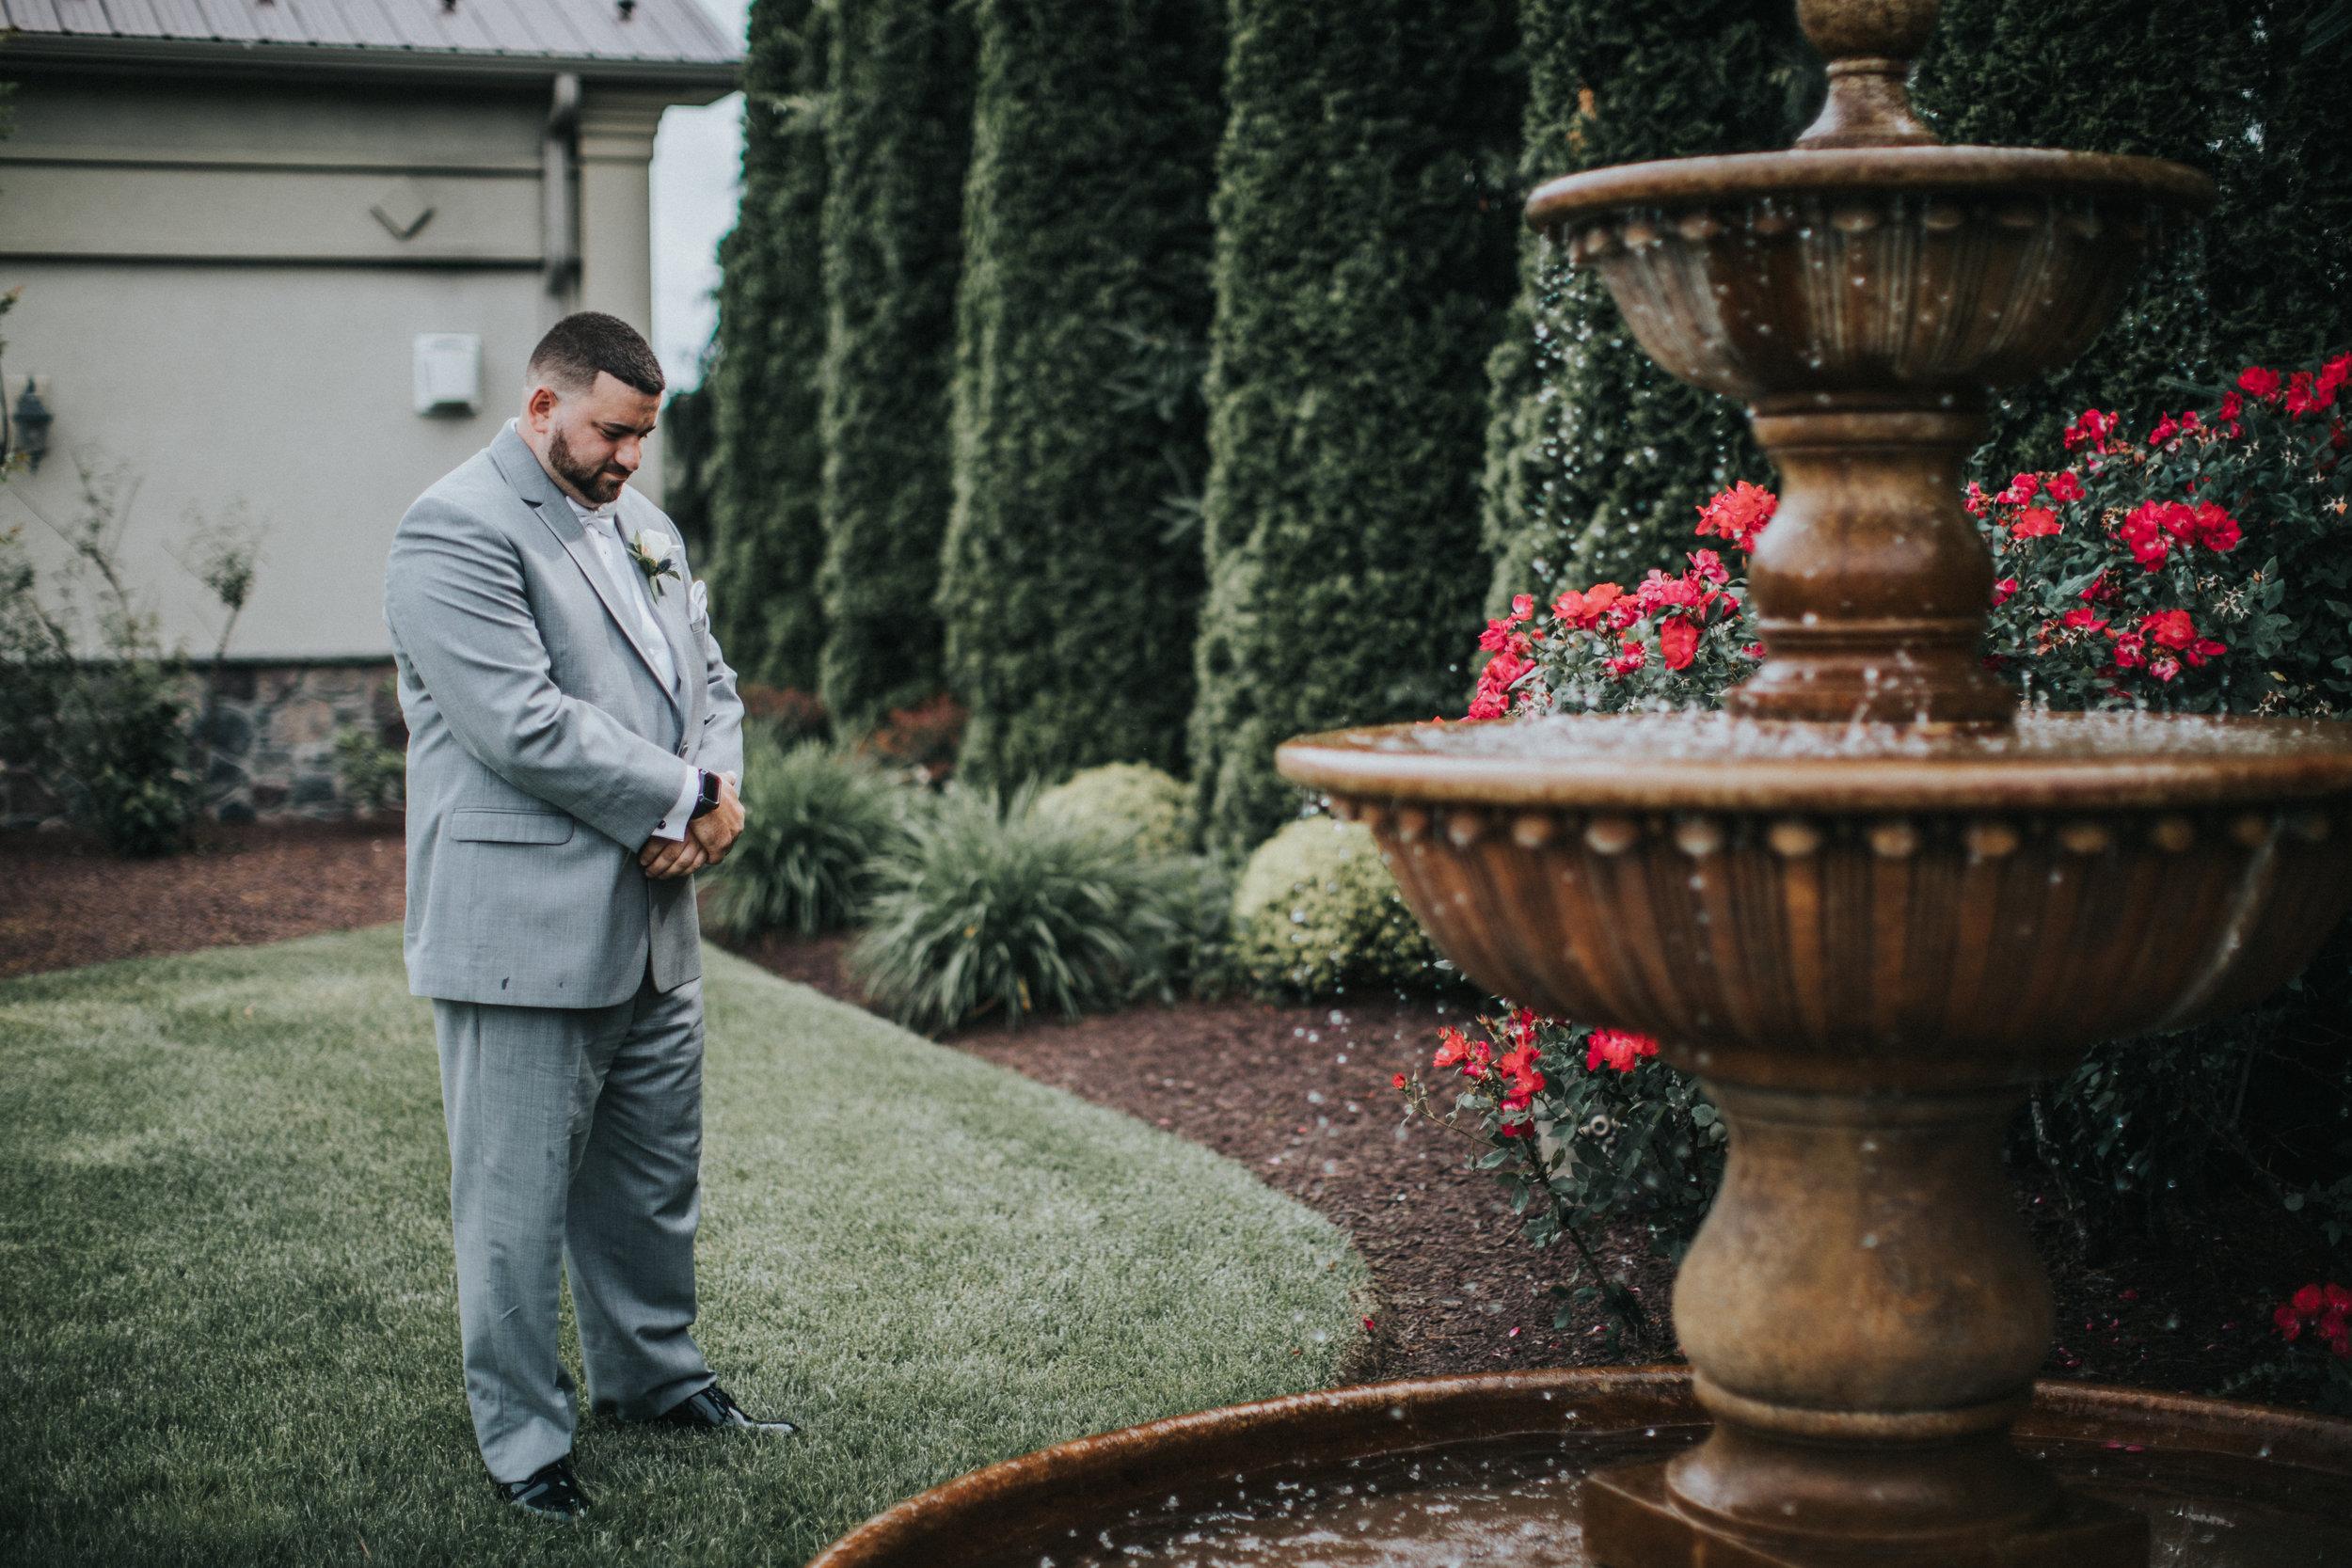 New-Jersey-Wedding-Photographer-JennaLynnPhotography-ValenzanoWinery-FirstLook-21.jpg